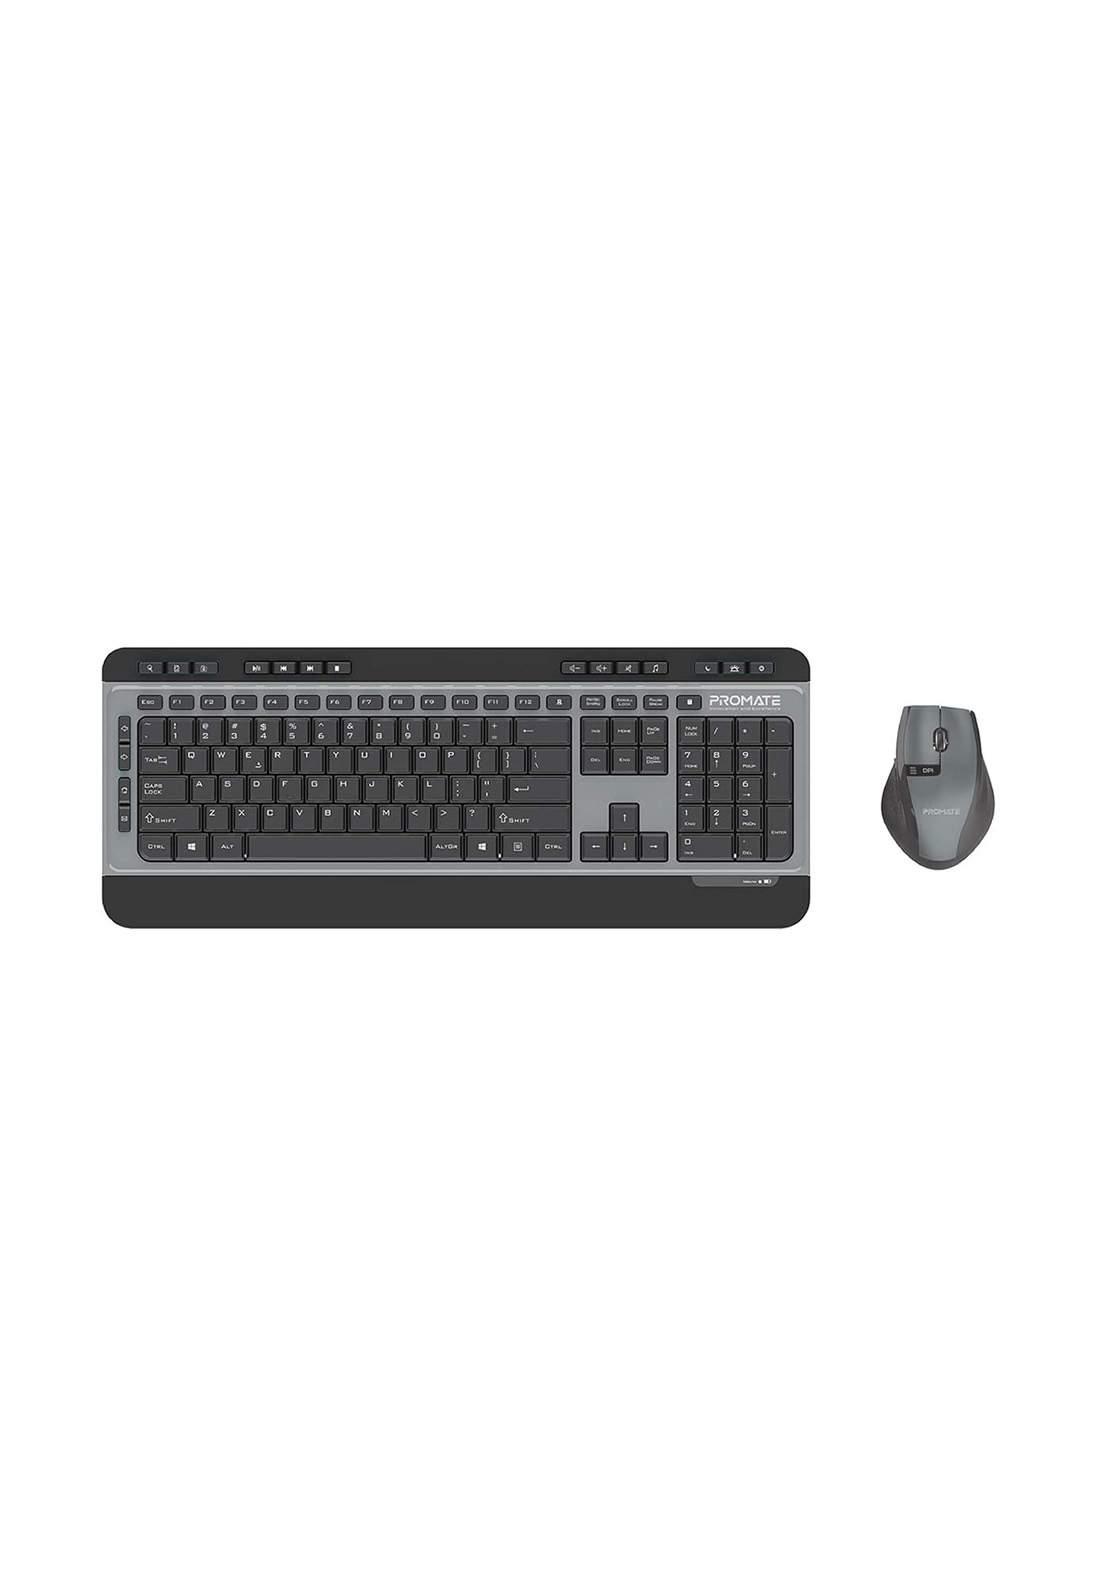 Promate ProCombo-9 Wireless Keyboard and Mouse Combo - Black  لوحة مفاتيح وفارة